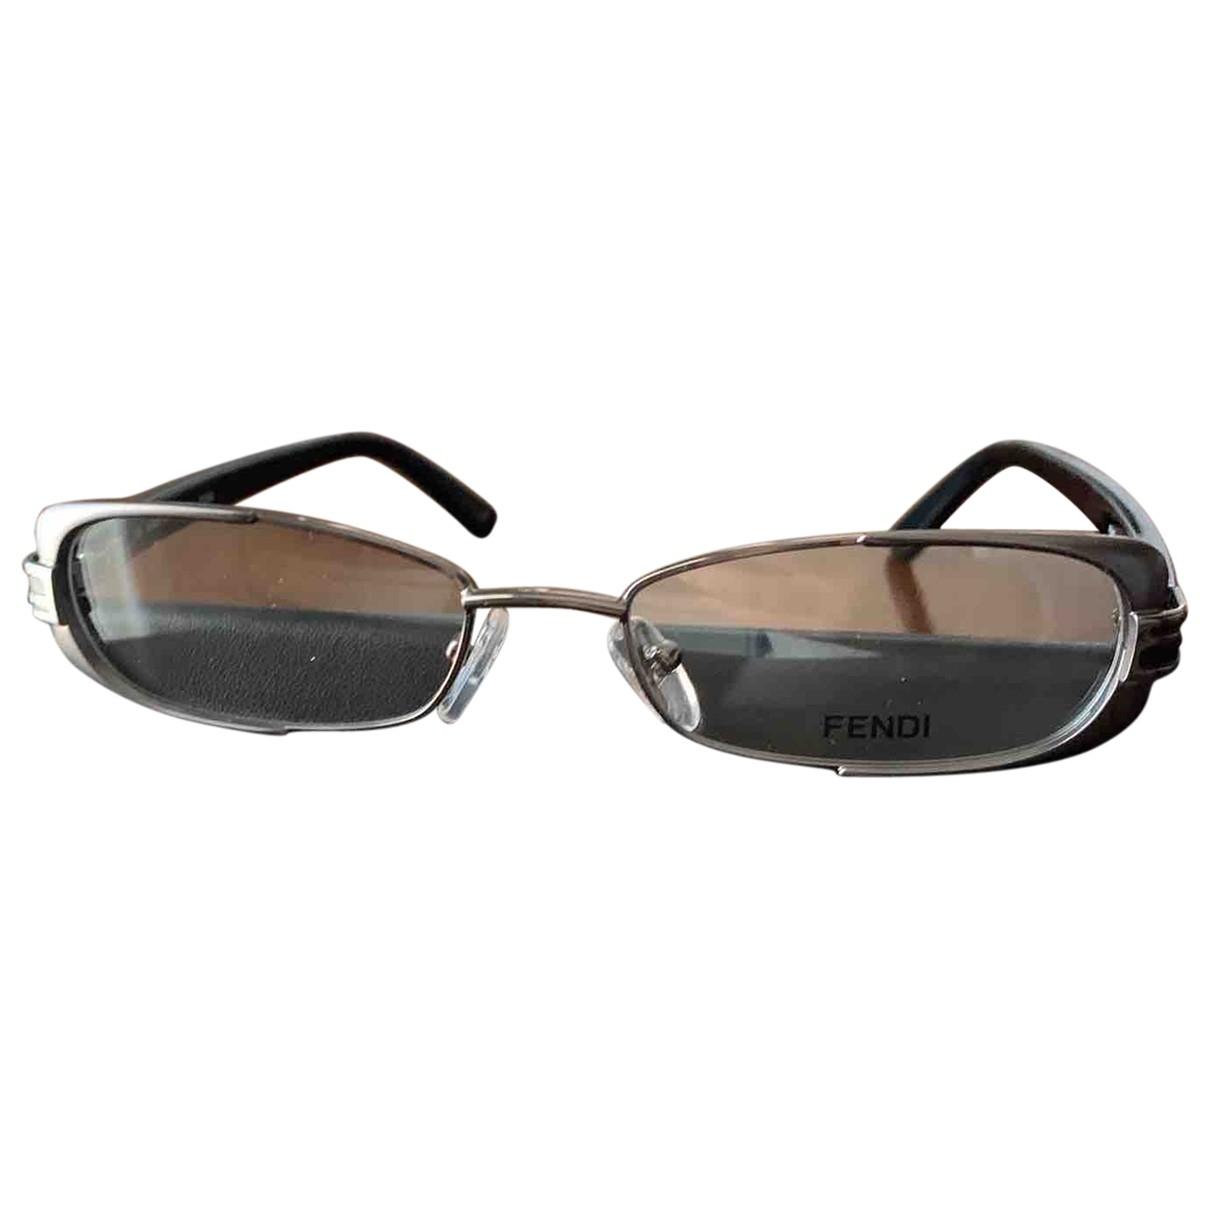 Fendi \N Sonnenbrillen in  Silber Kunststoff